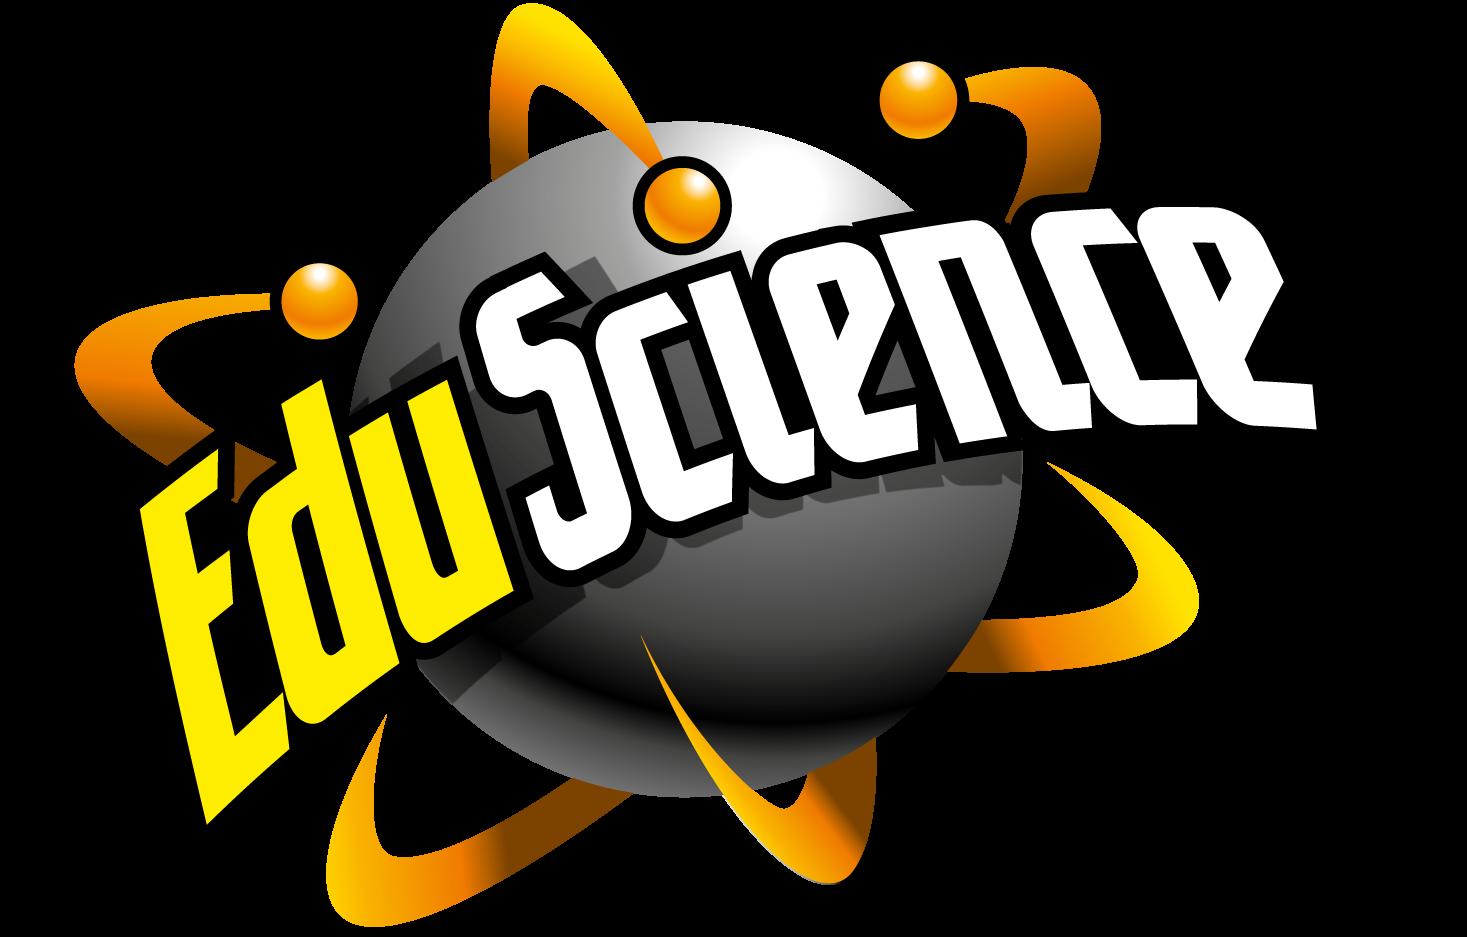 Edu science telescopes microscopes. Scientist clipart microscope